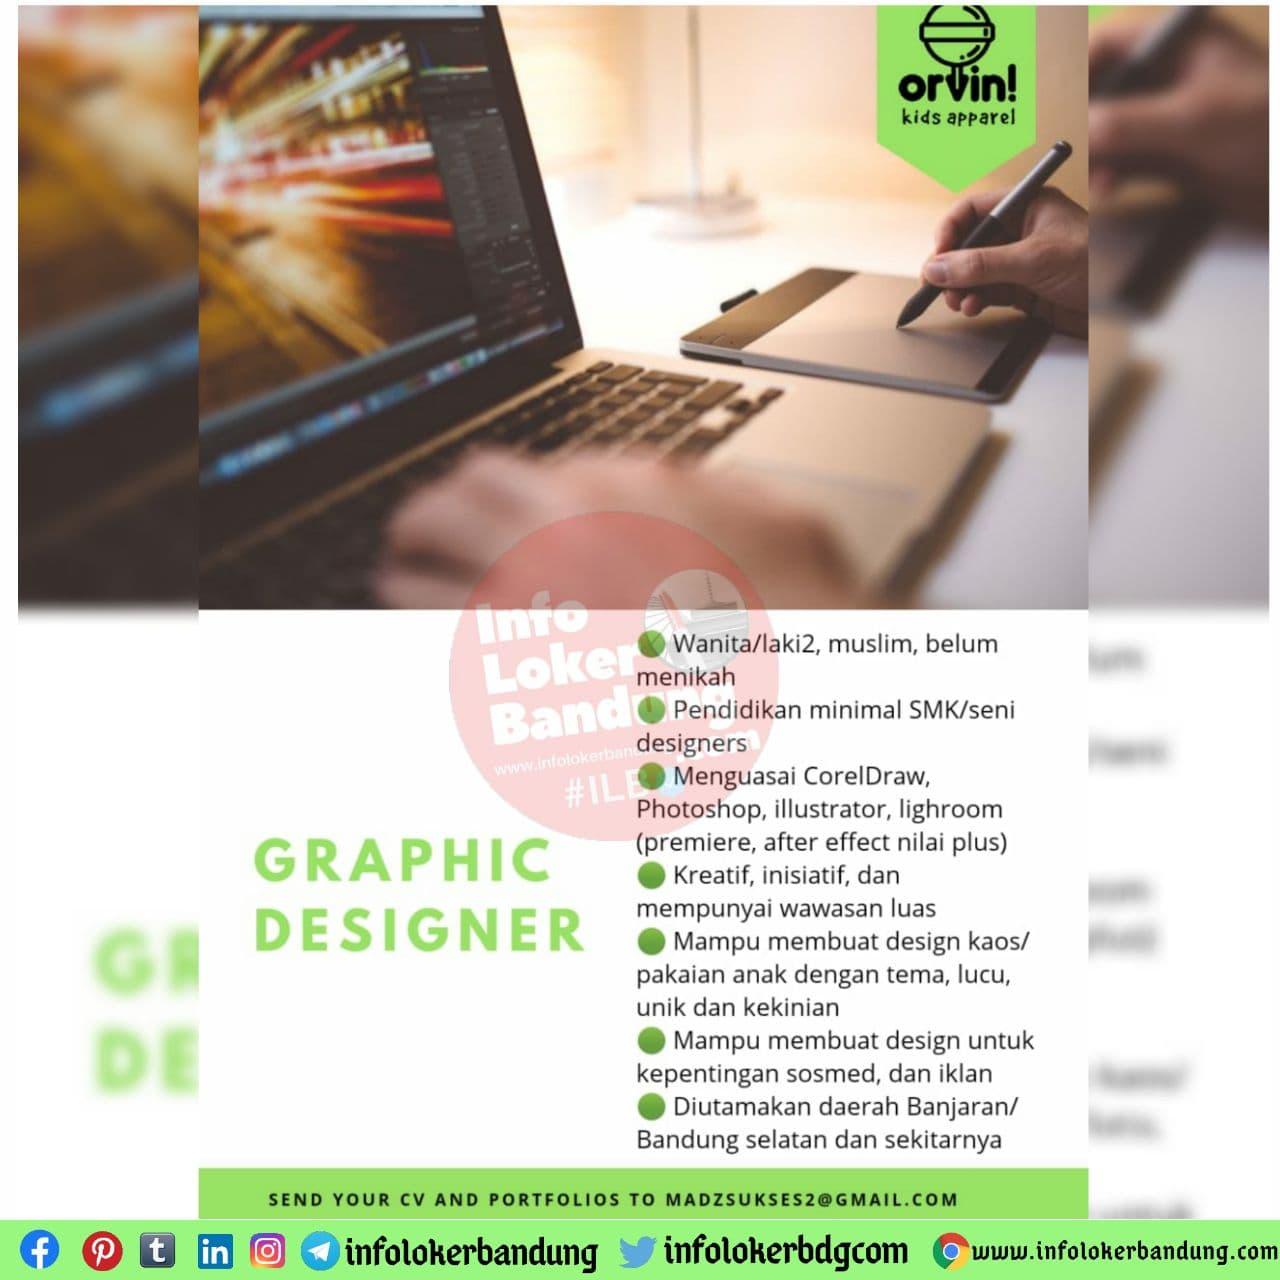 Lowongan Kerja Graphic Designer Orvin Kids Apparel Bandung November 2020